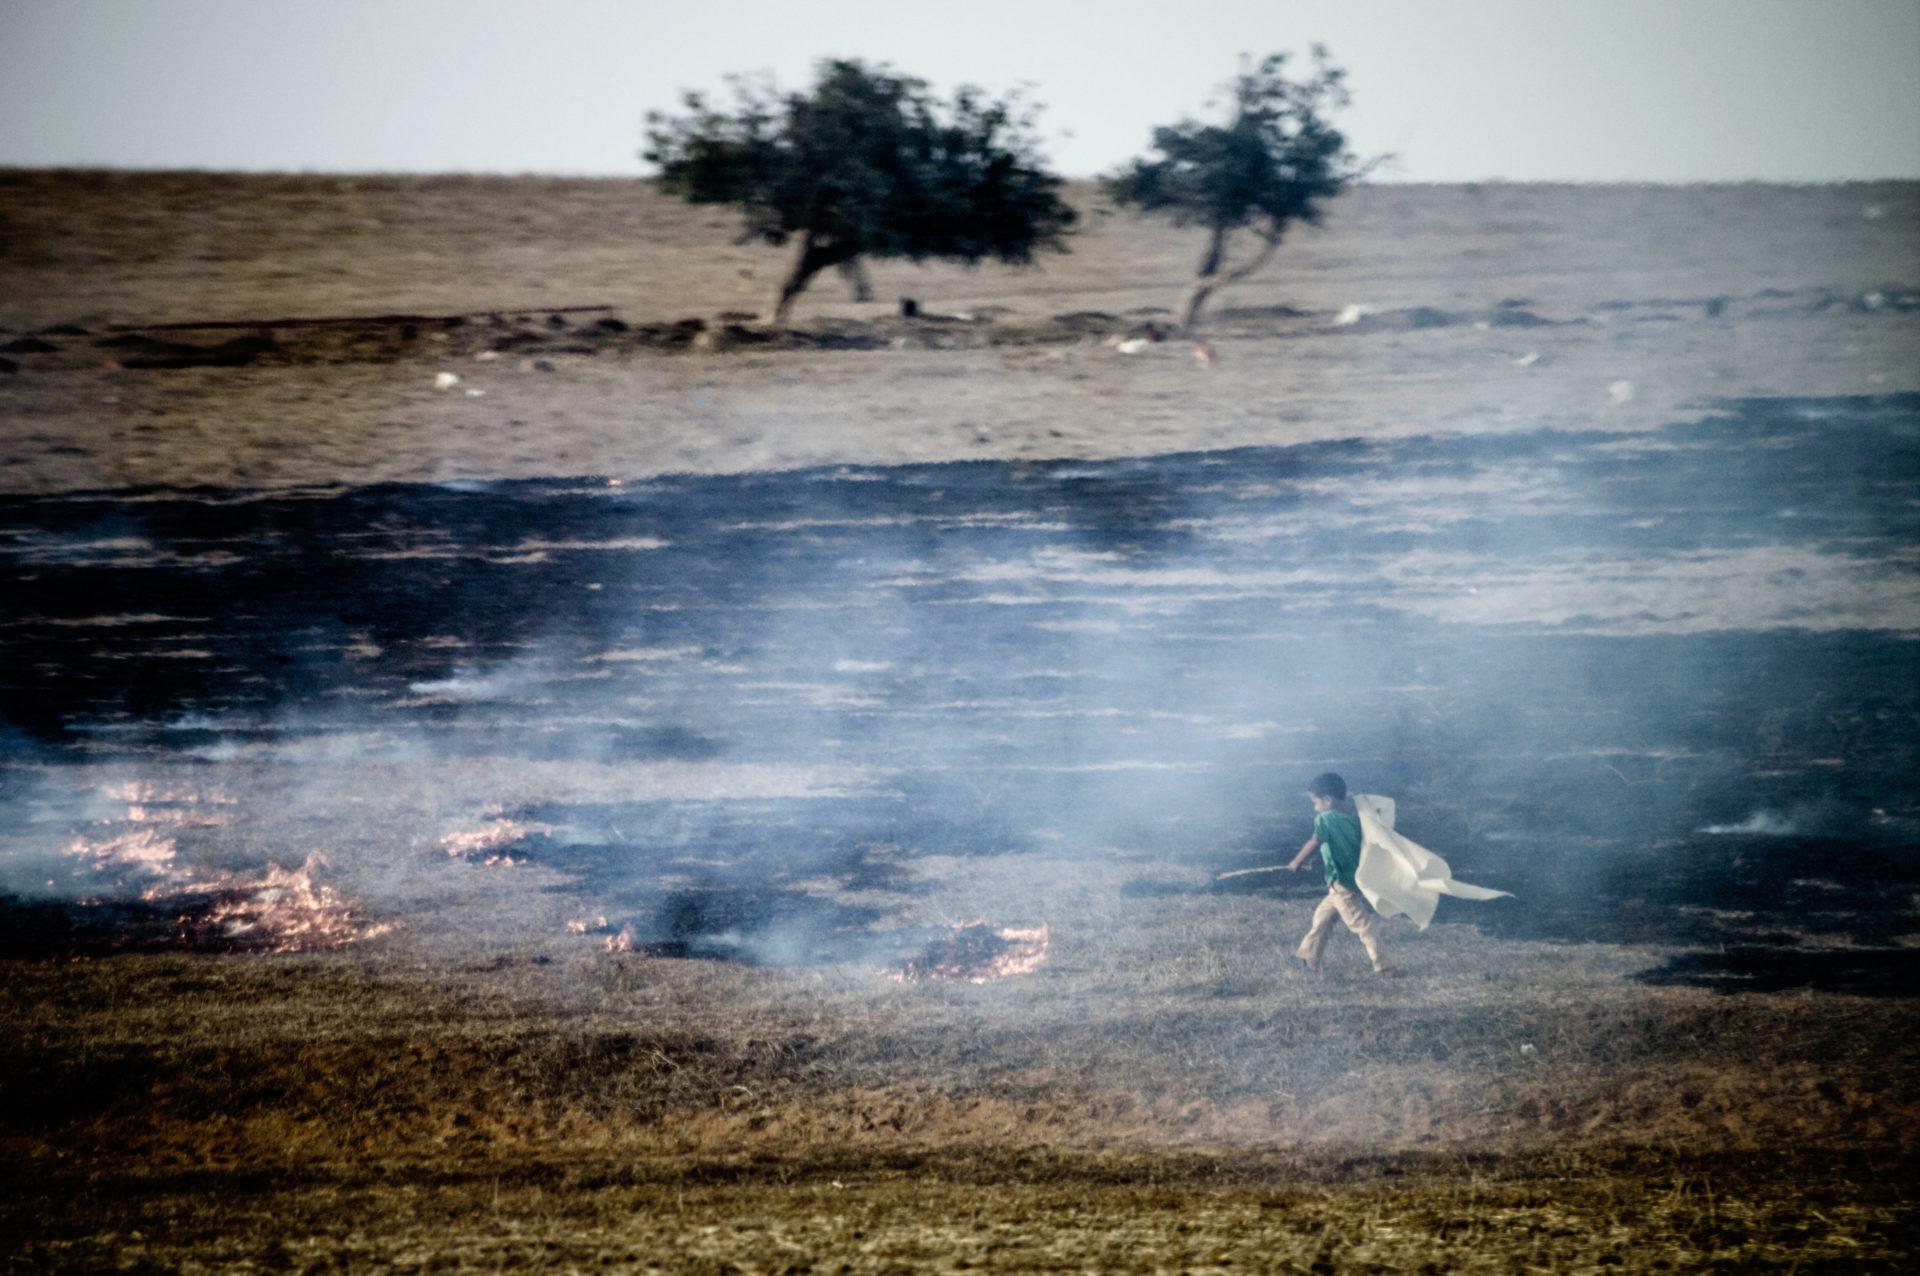 GIZ_Morocco_Culture_Poverty_IGP2021_Carolin-Weinkopf